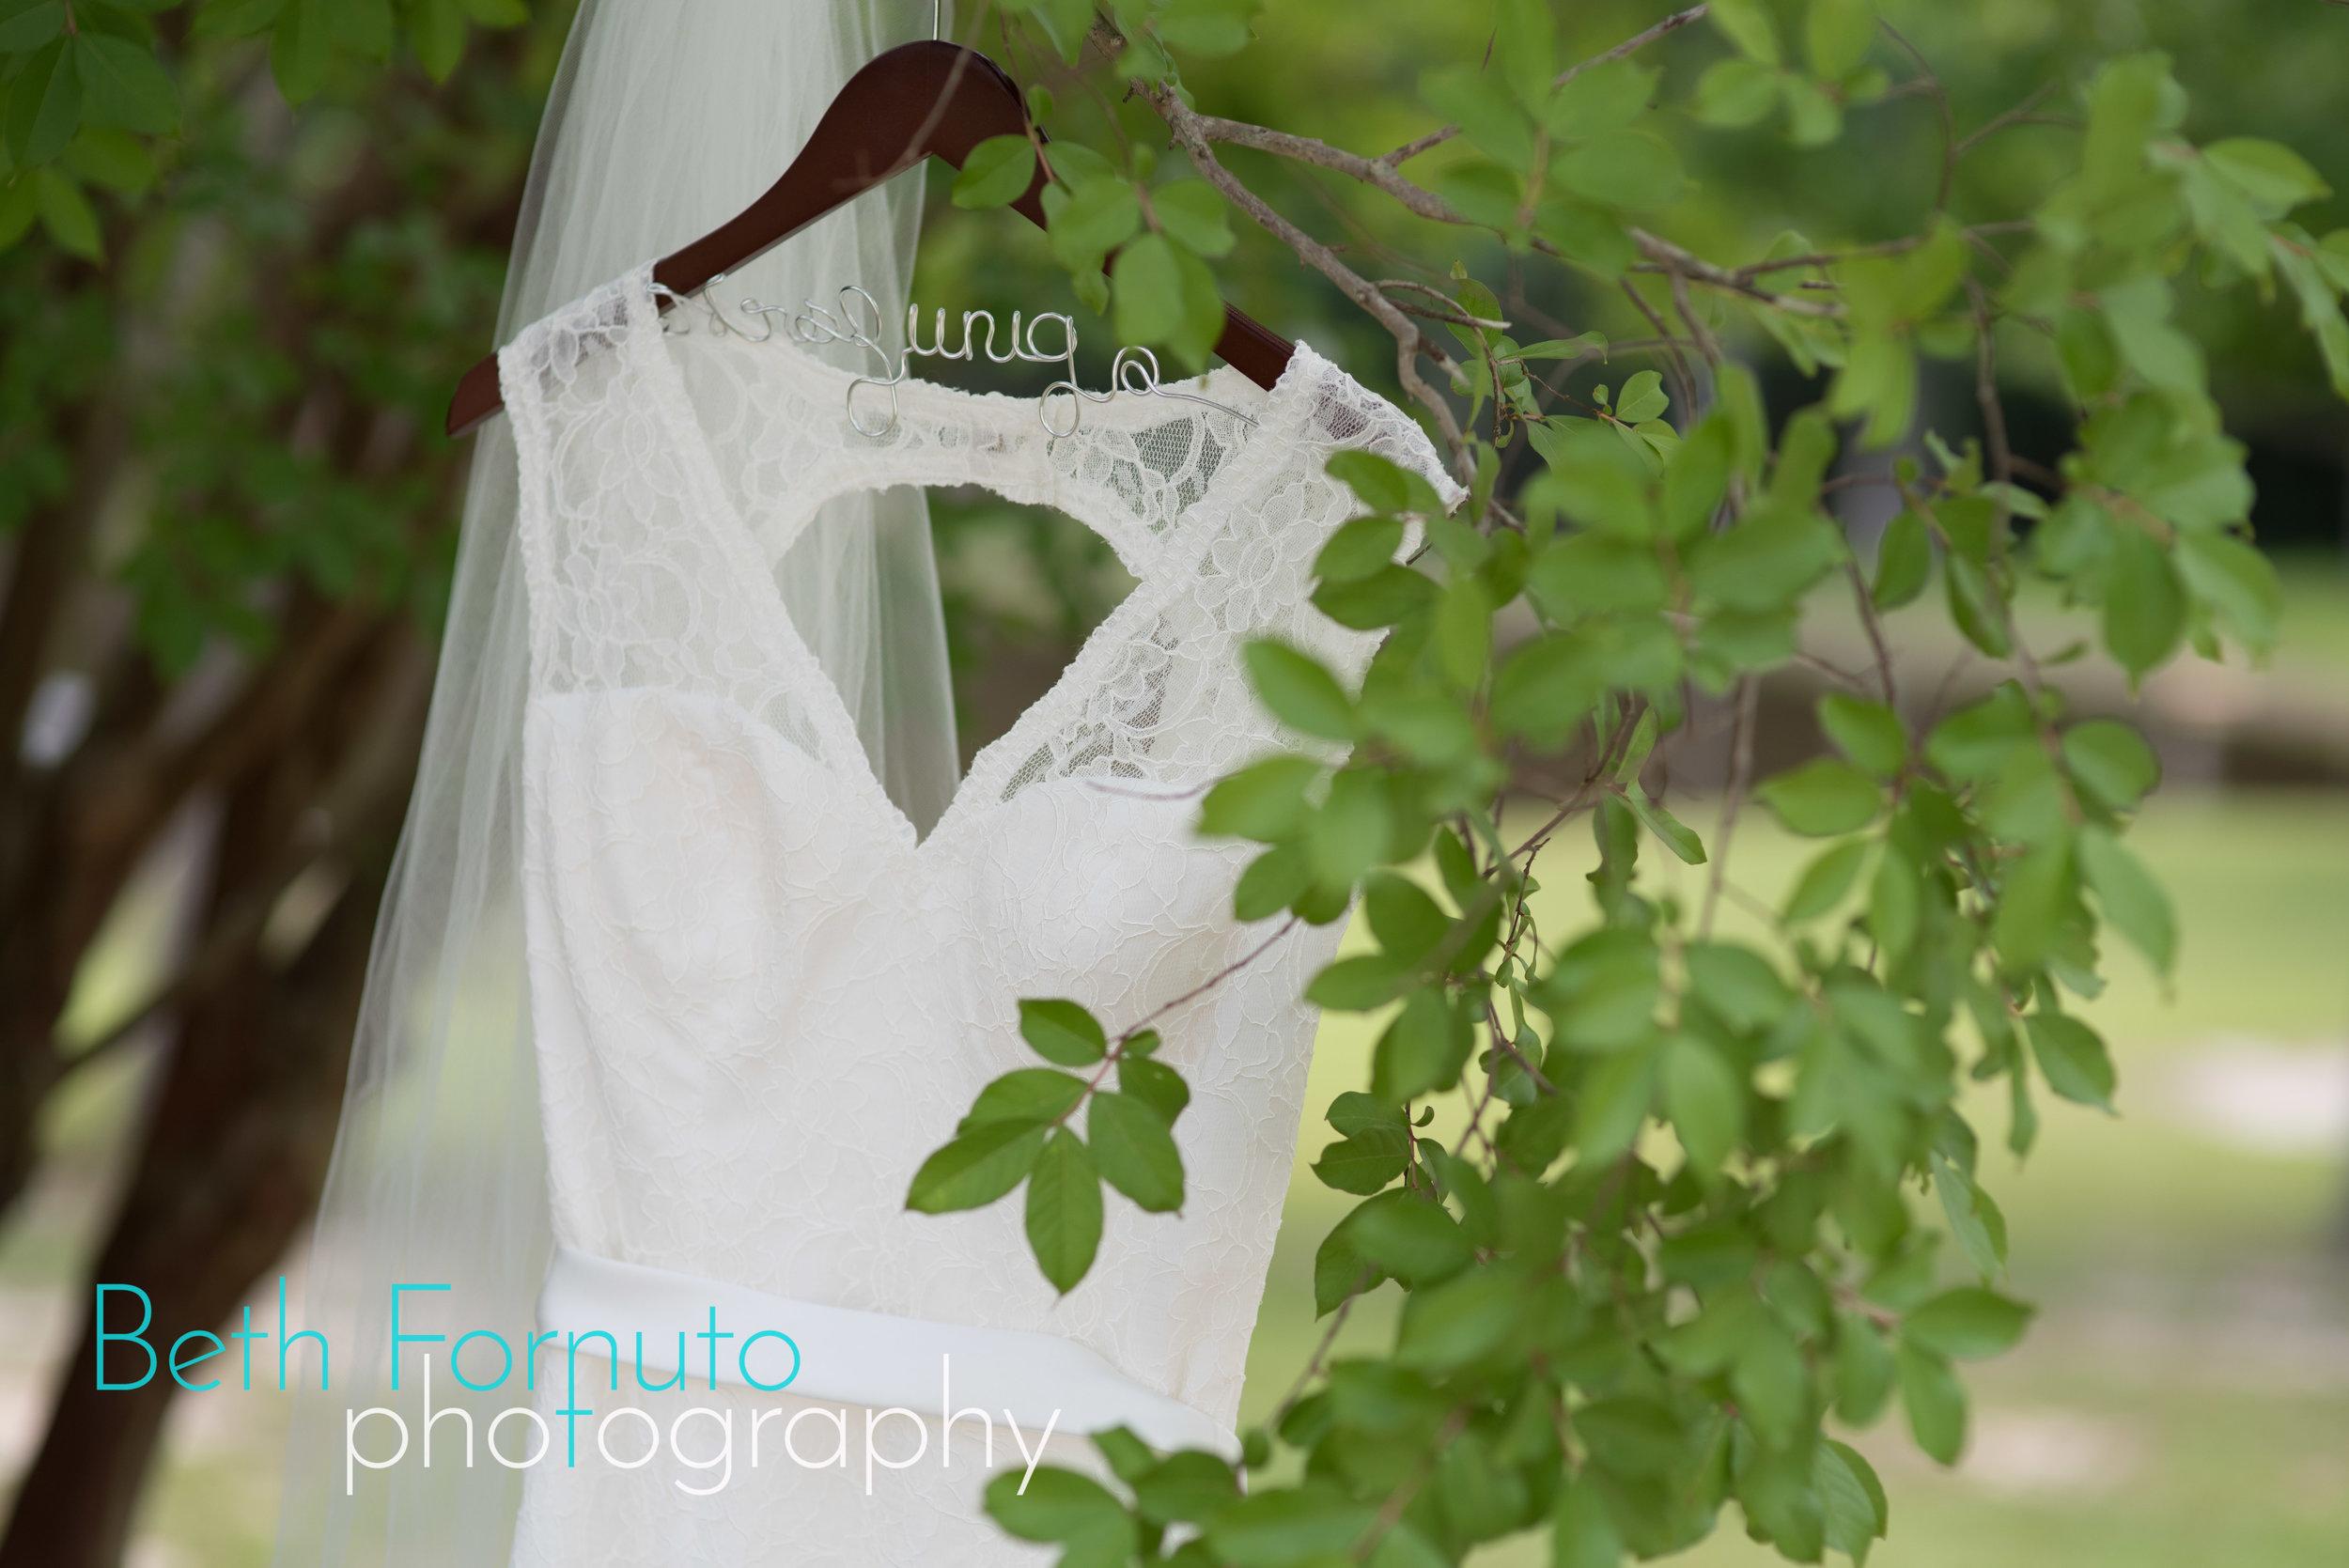 DSC_1434Beth Fornuto Photography.jpg